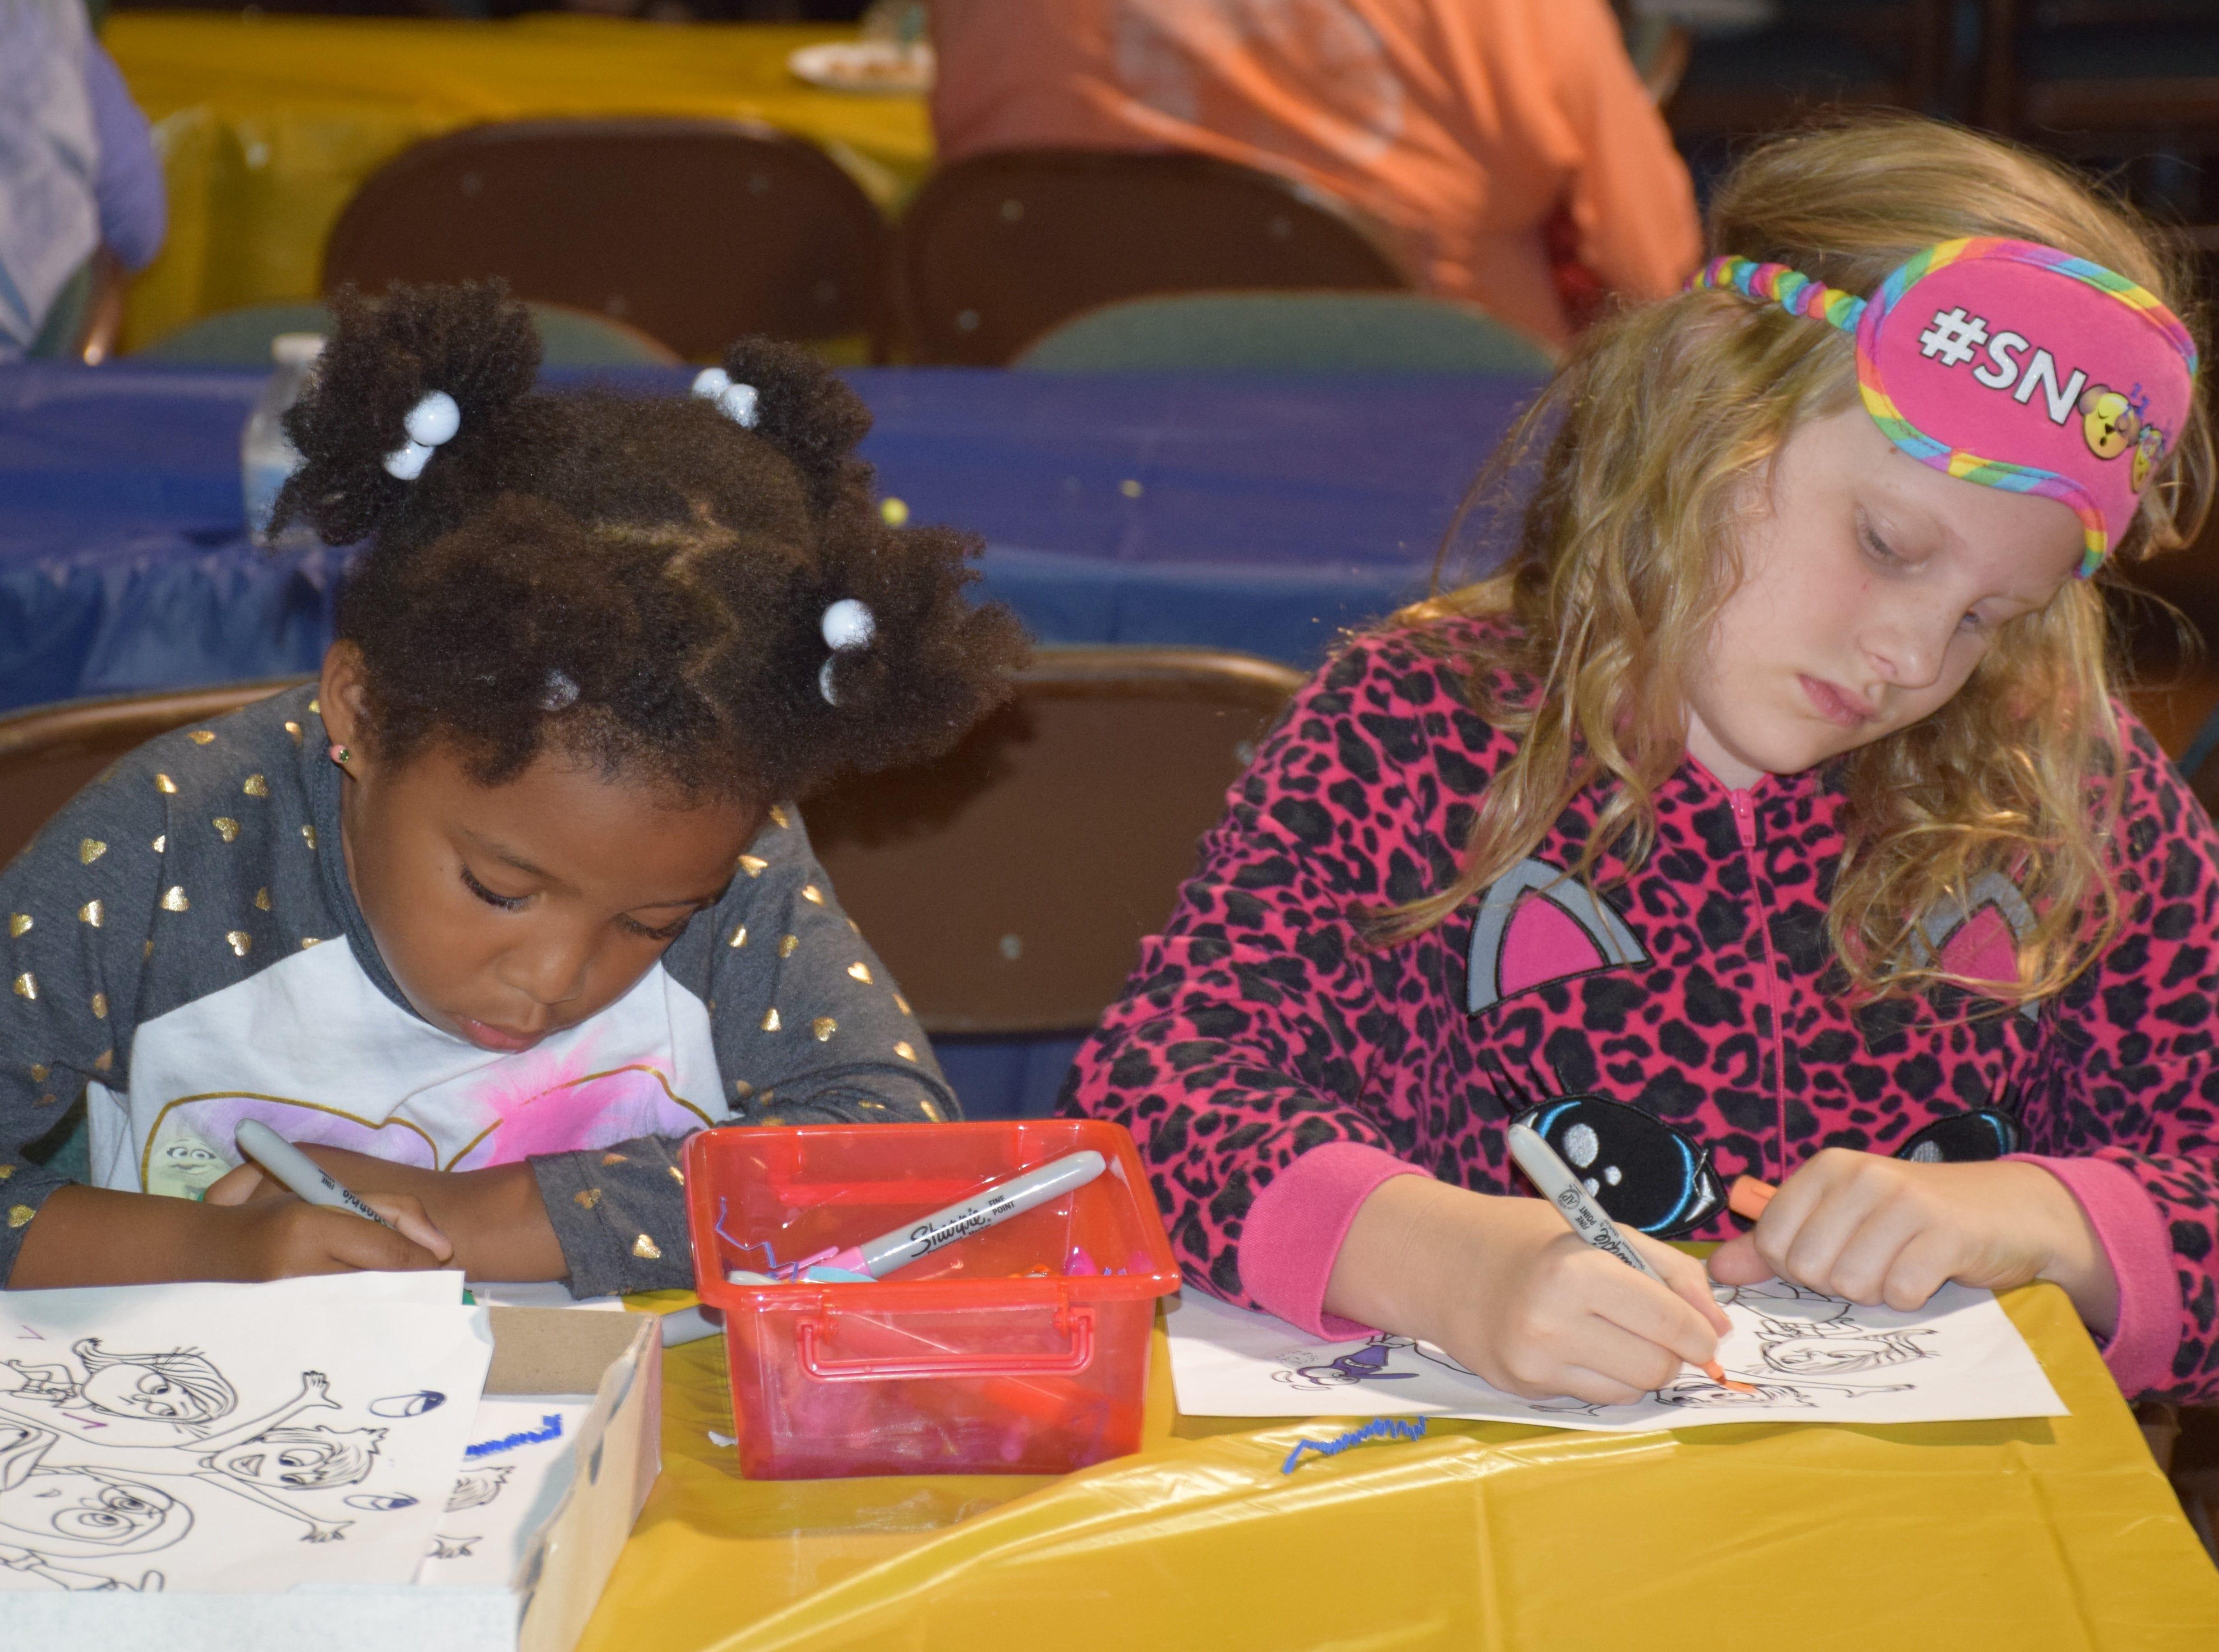 Coreyanah, 5, and Payton, 8, enjoy the arts and crafts.